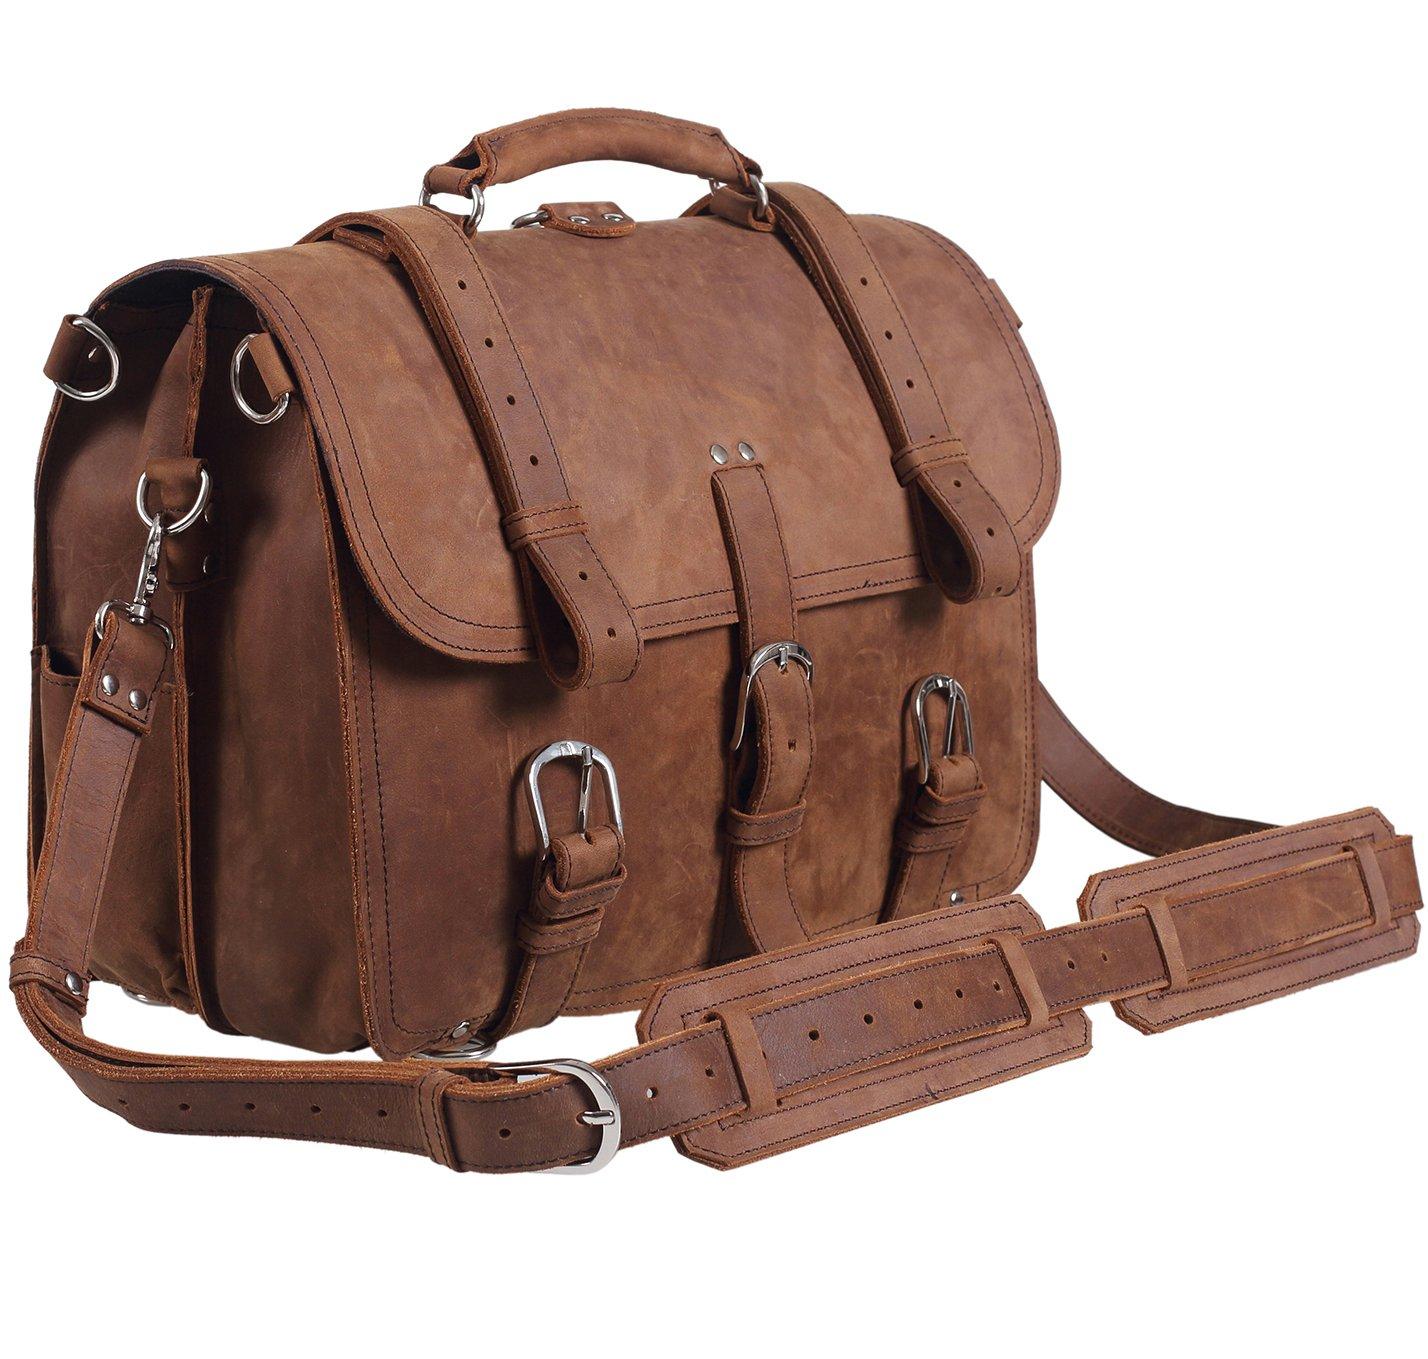 Polare Men's Top Quality Full Grain Leather Briefcase / Shoulder Bag / Messenger Bag / Satchel Fit 17'' Laptop